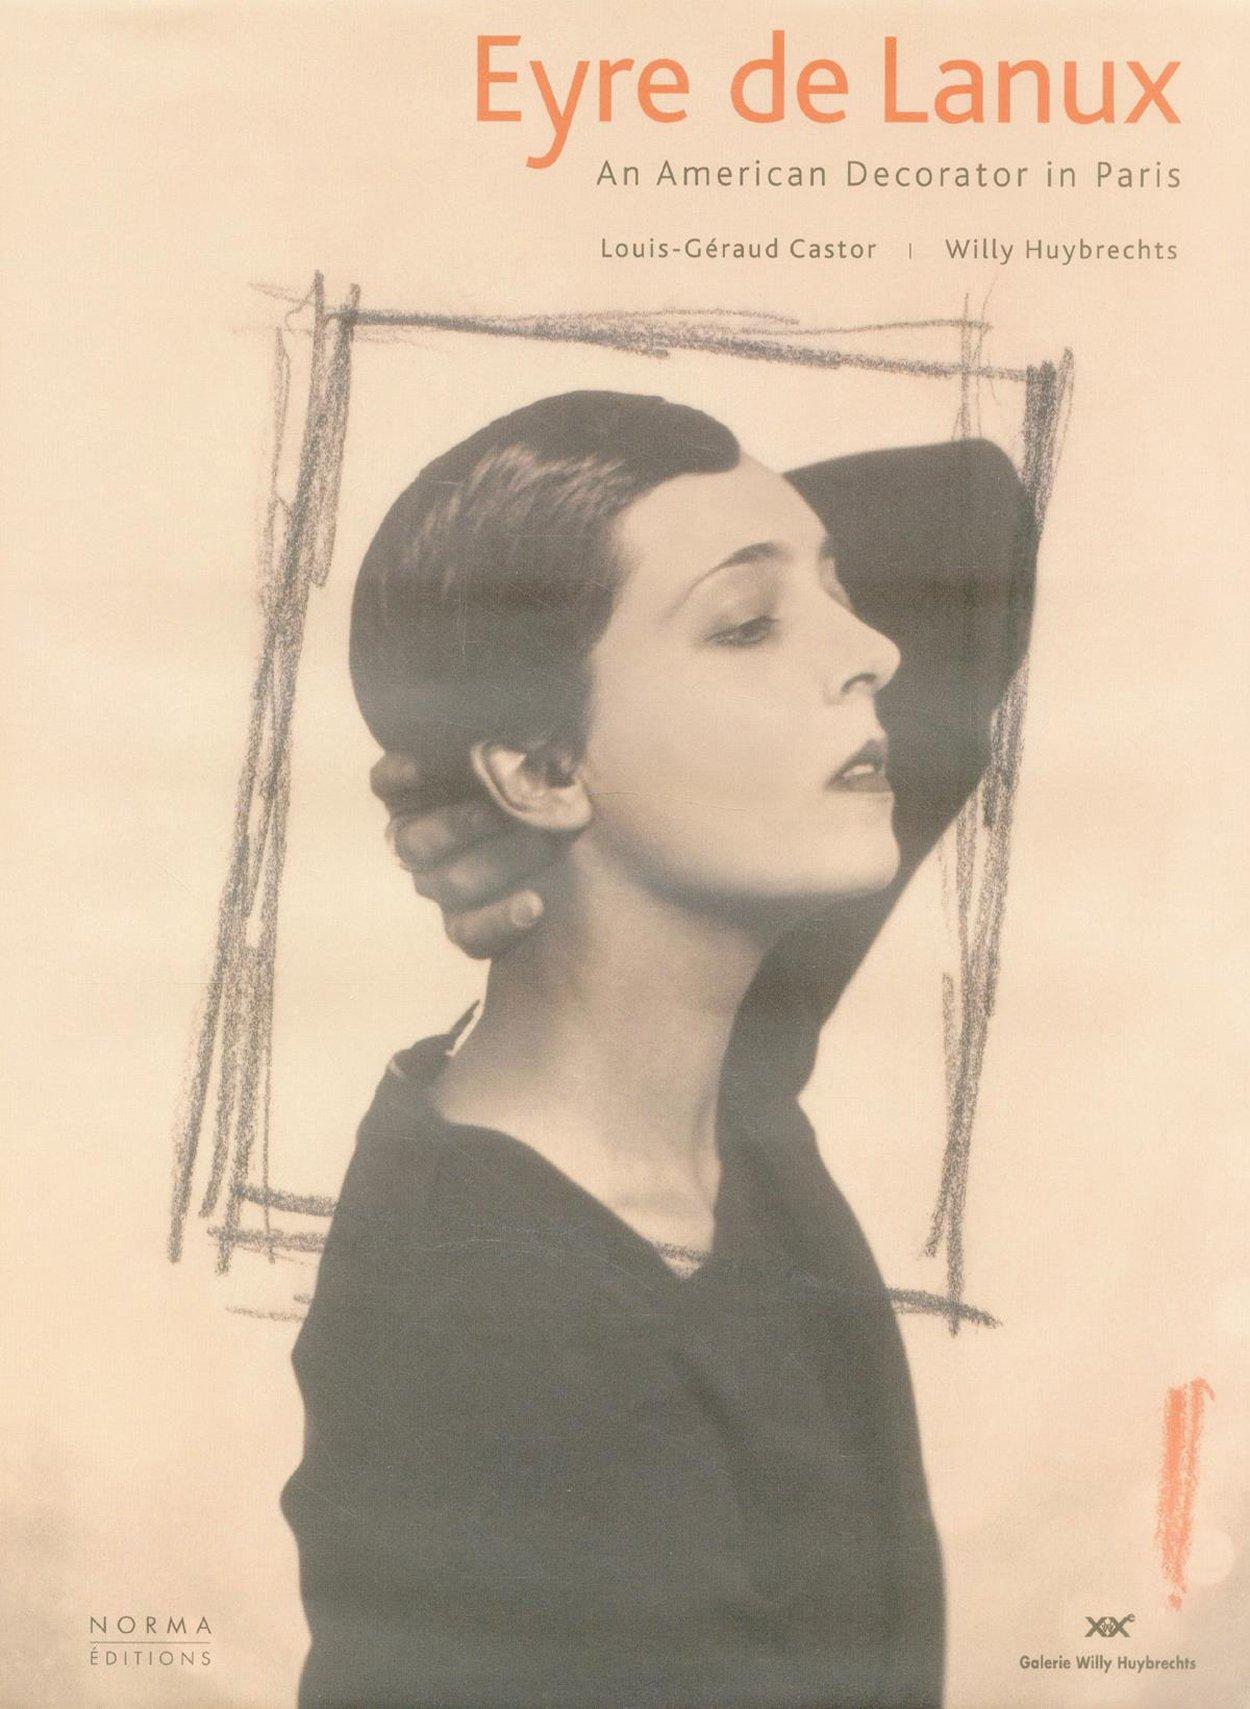 Eyre de Lanux: An American Decorator in Paris